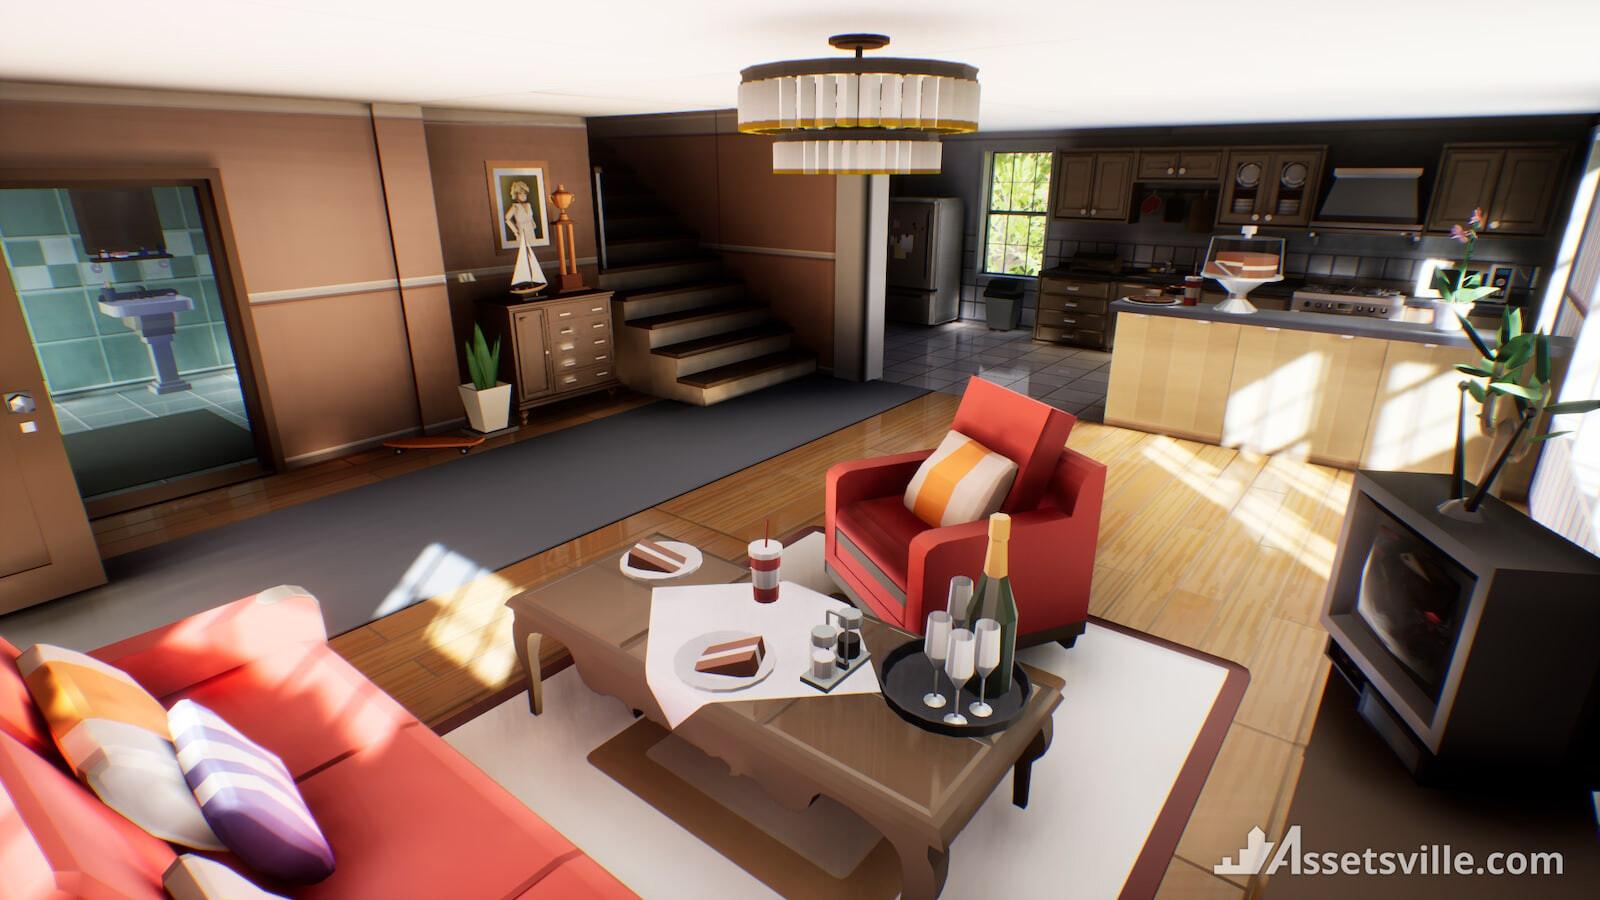 Low Poly Game Art | 3d Lowpoly art in blender | Blender LowPoly World | Lowpoly interiors | Low Poly Models | 3d Game Models